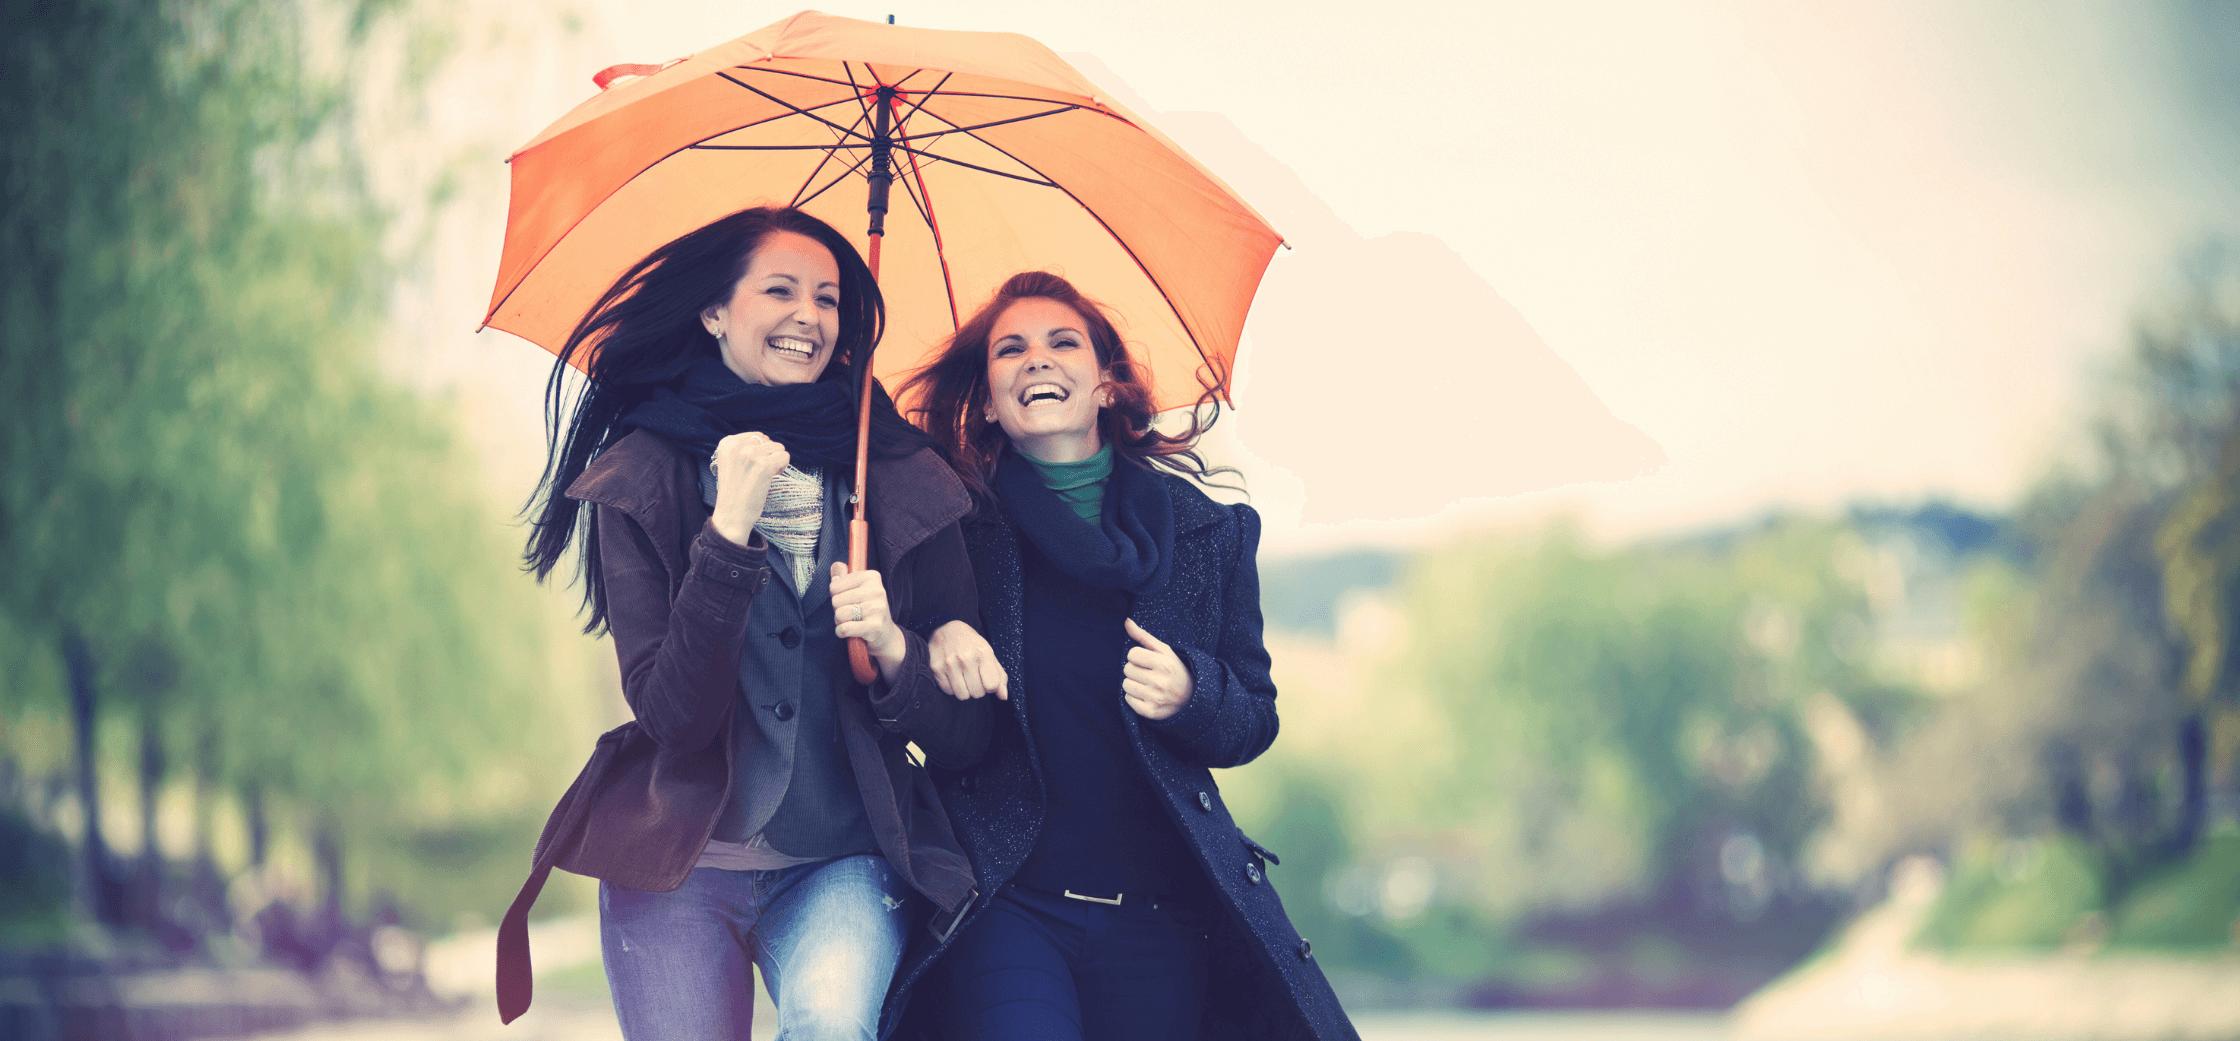 ladies walking-how to make good friends